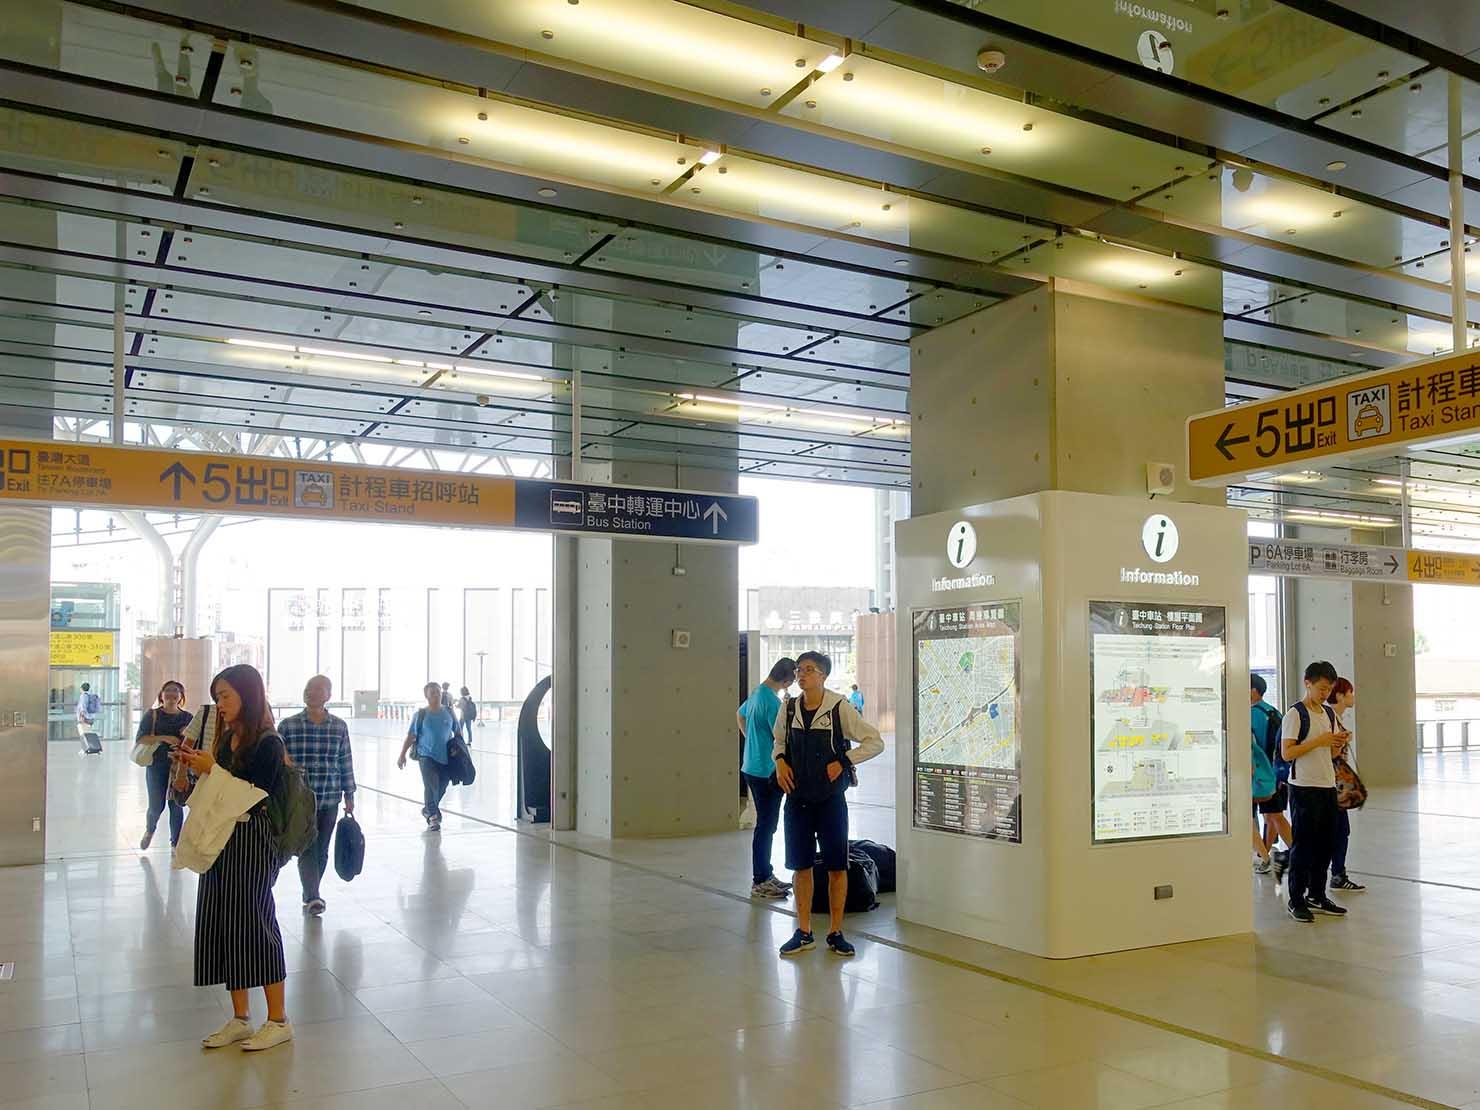 台鐵台中駅の改札前